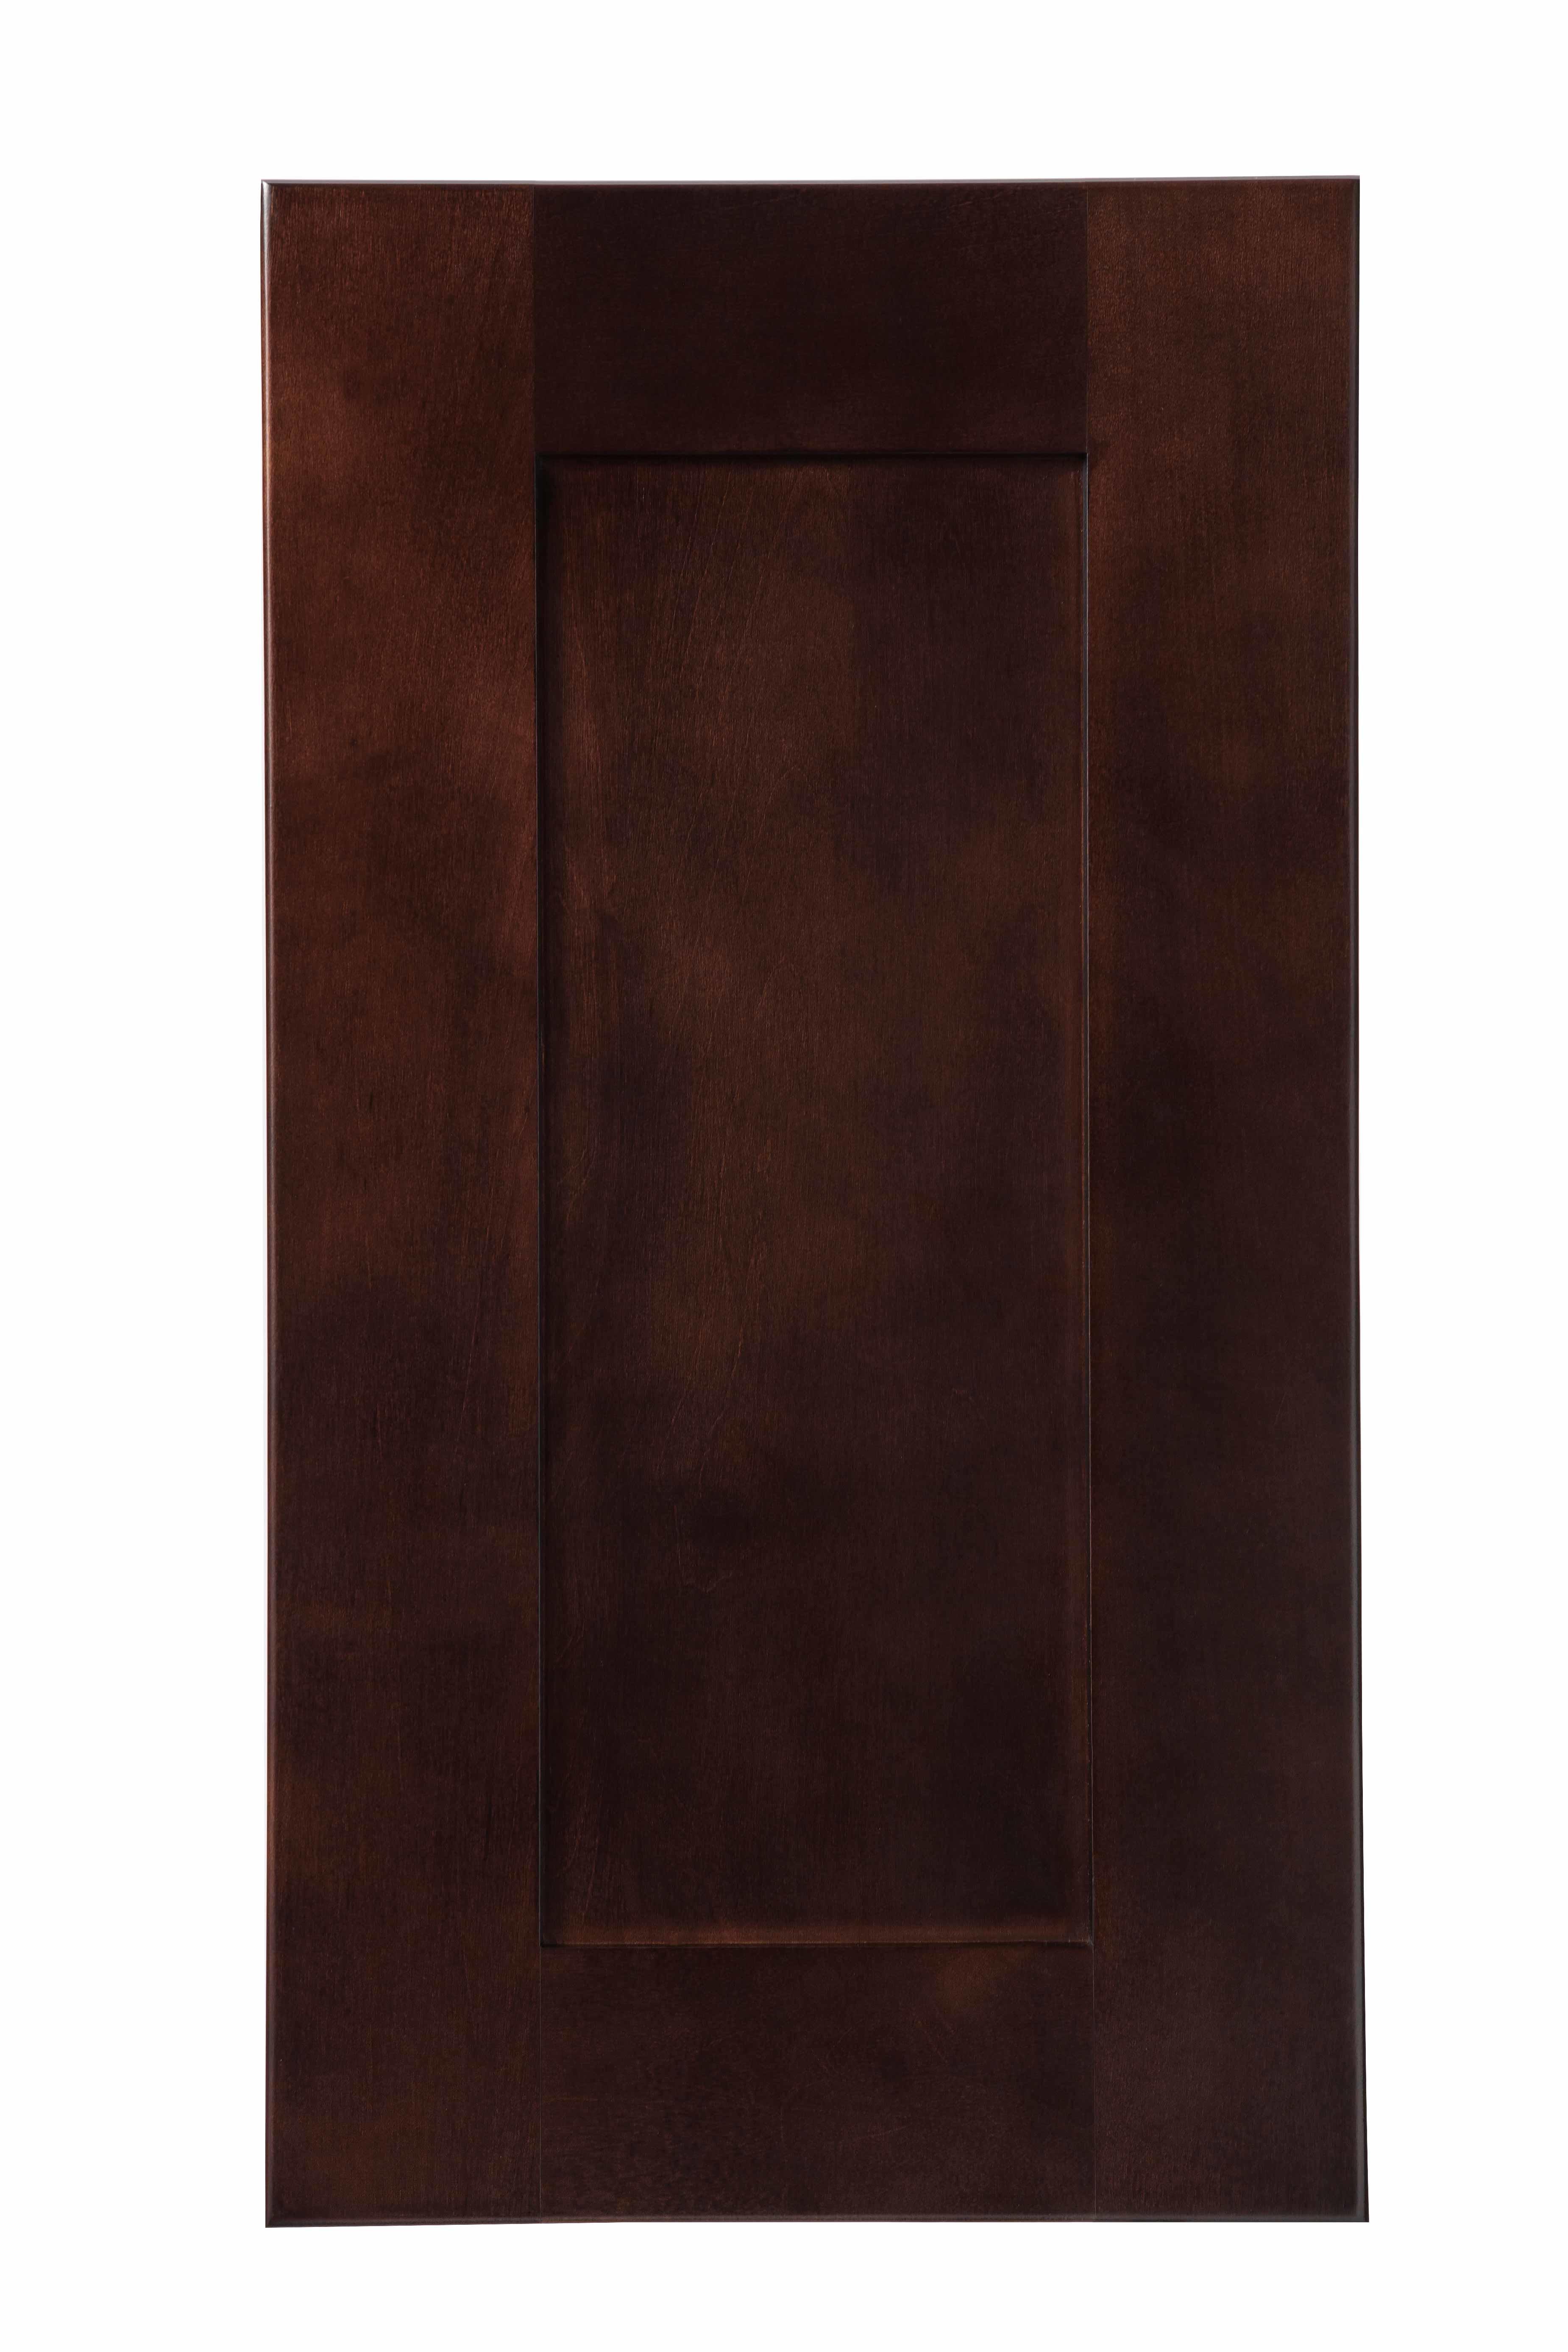 Craftsman Kitchen Cabinets Salt Lake